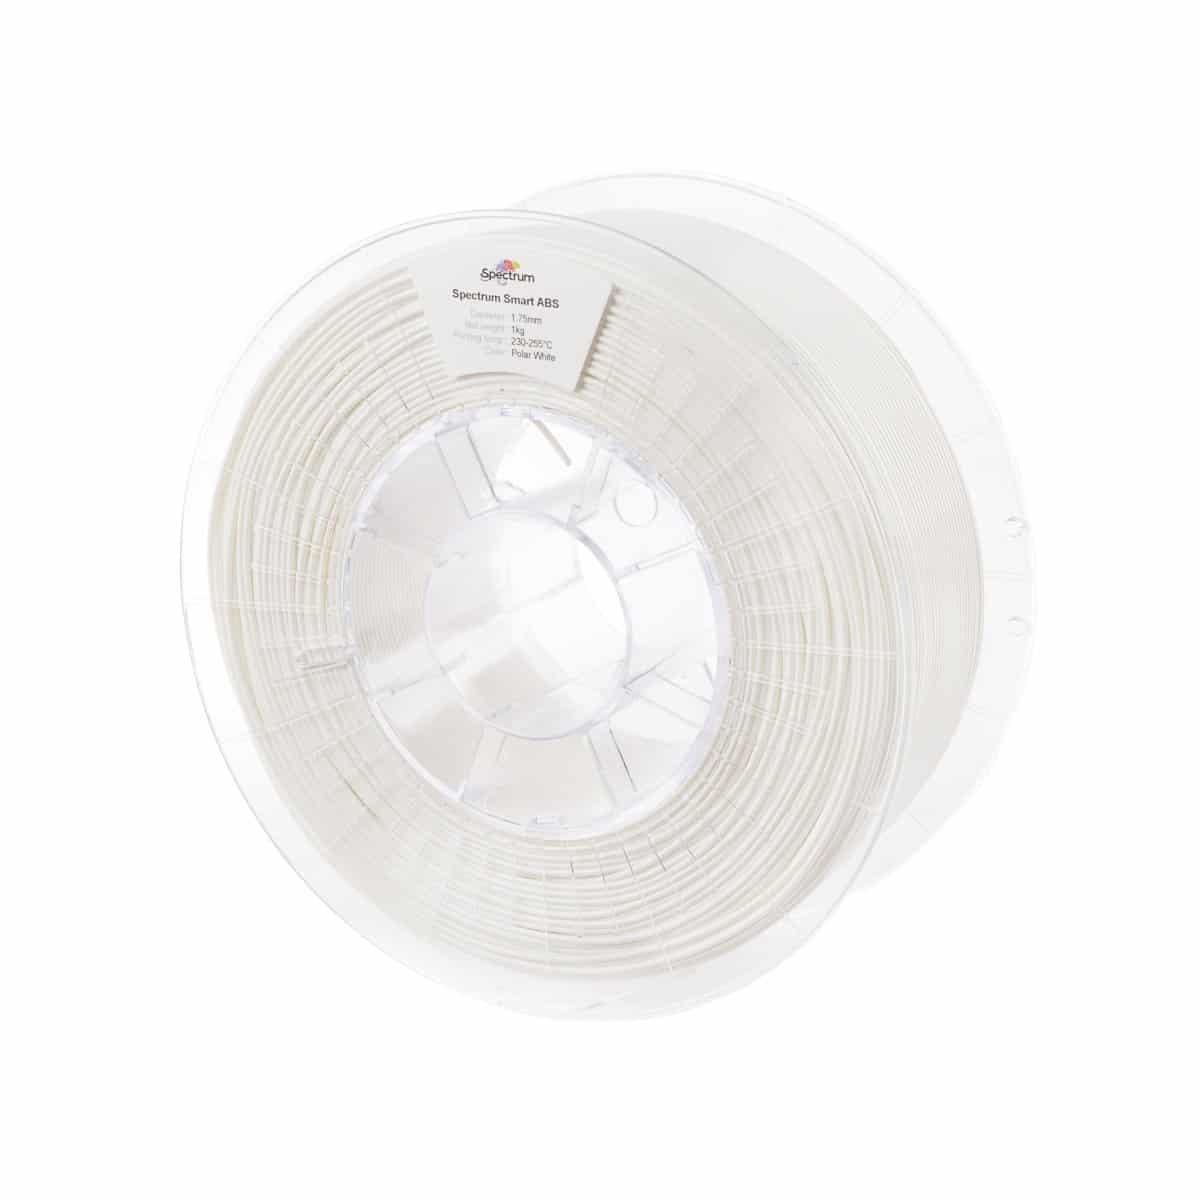 Image of   Spectrum Filaments - Smart ABS - 1.75mm - Polar White - 1 kg